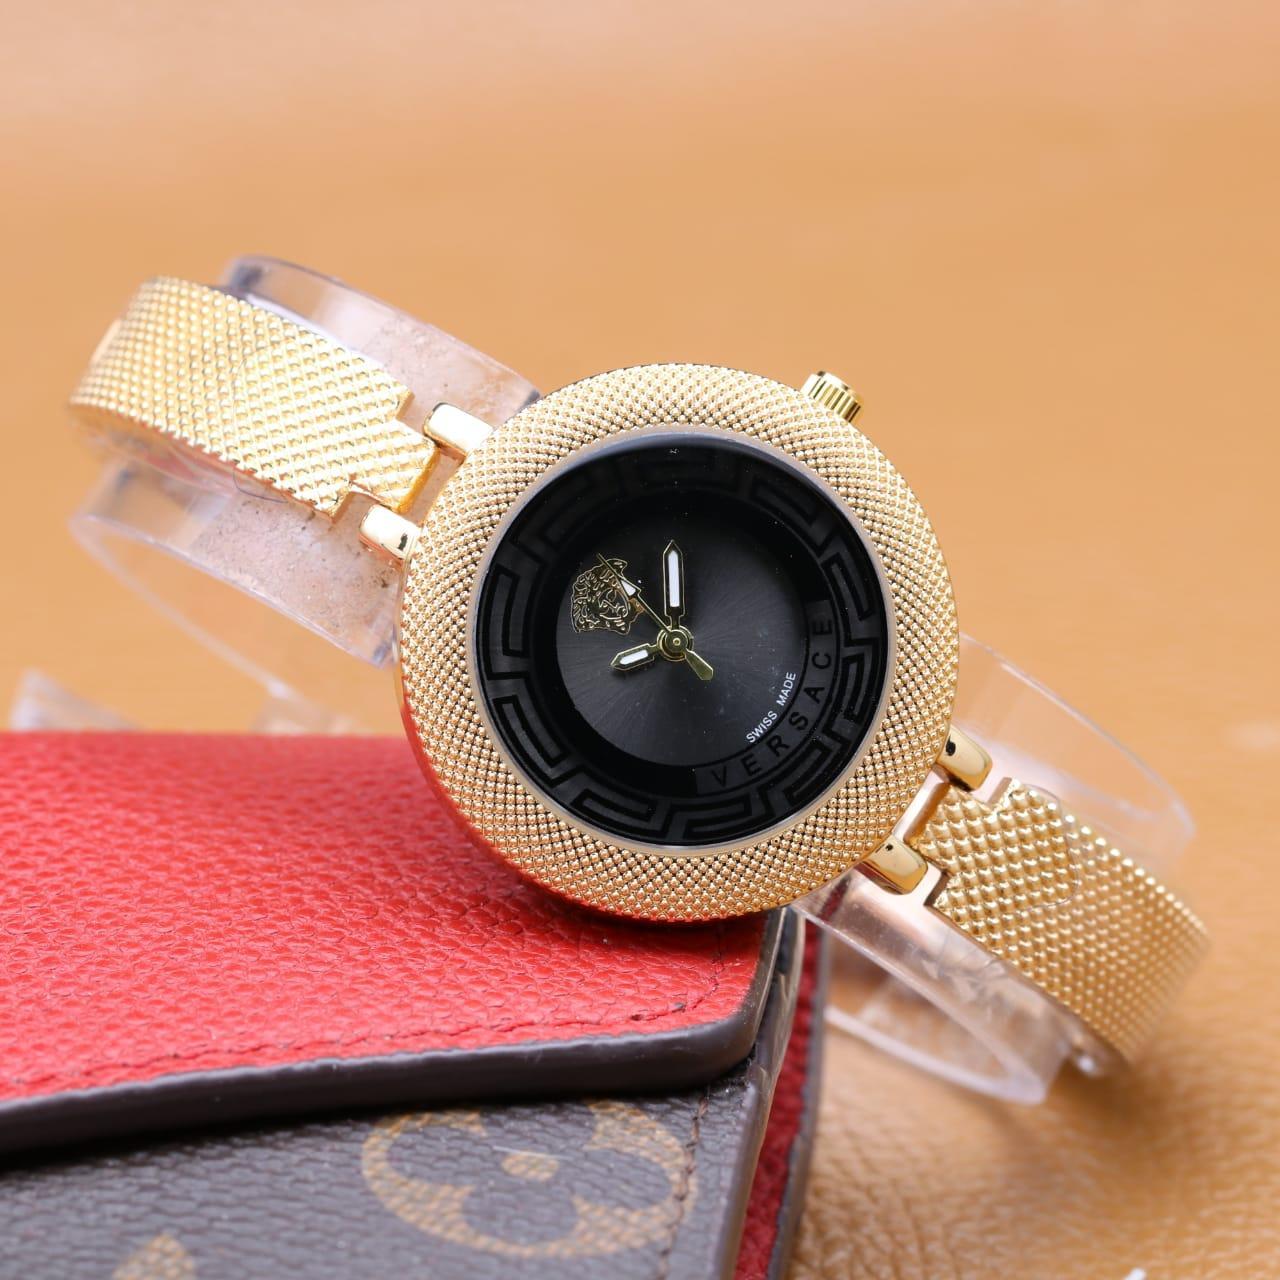 Versace V Ray Chronograph Vdb040014 Jam Tangan Pria Hitam4 Daftar Rucci 15711 Silver Wanita Analog Watch 1